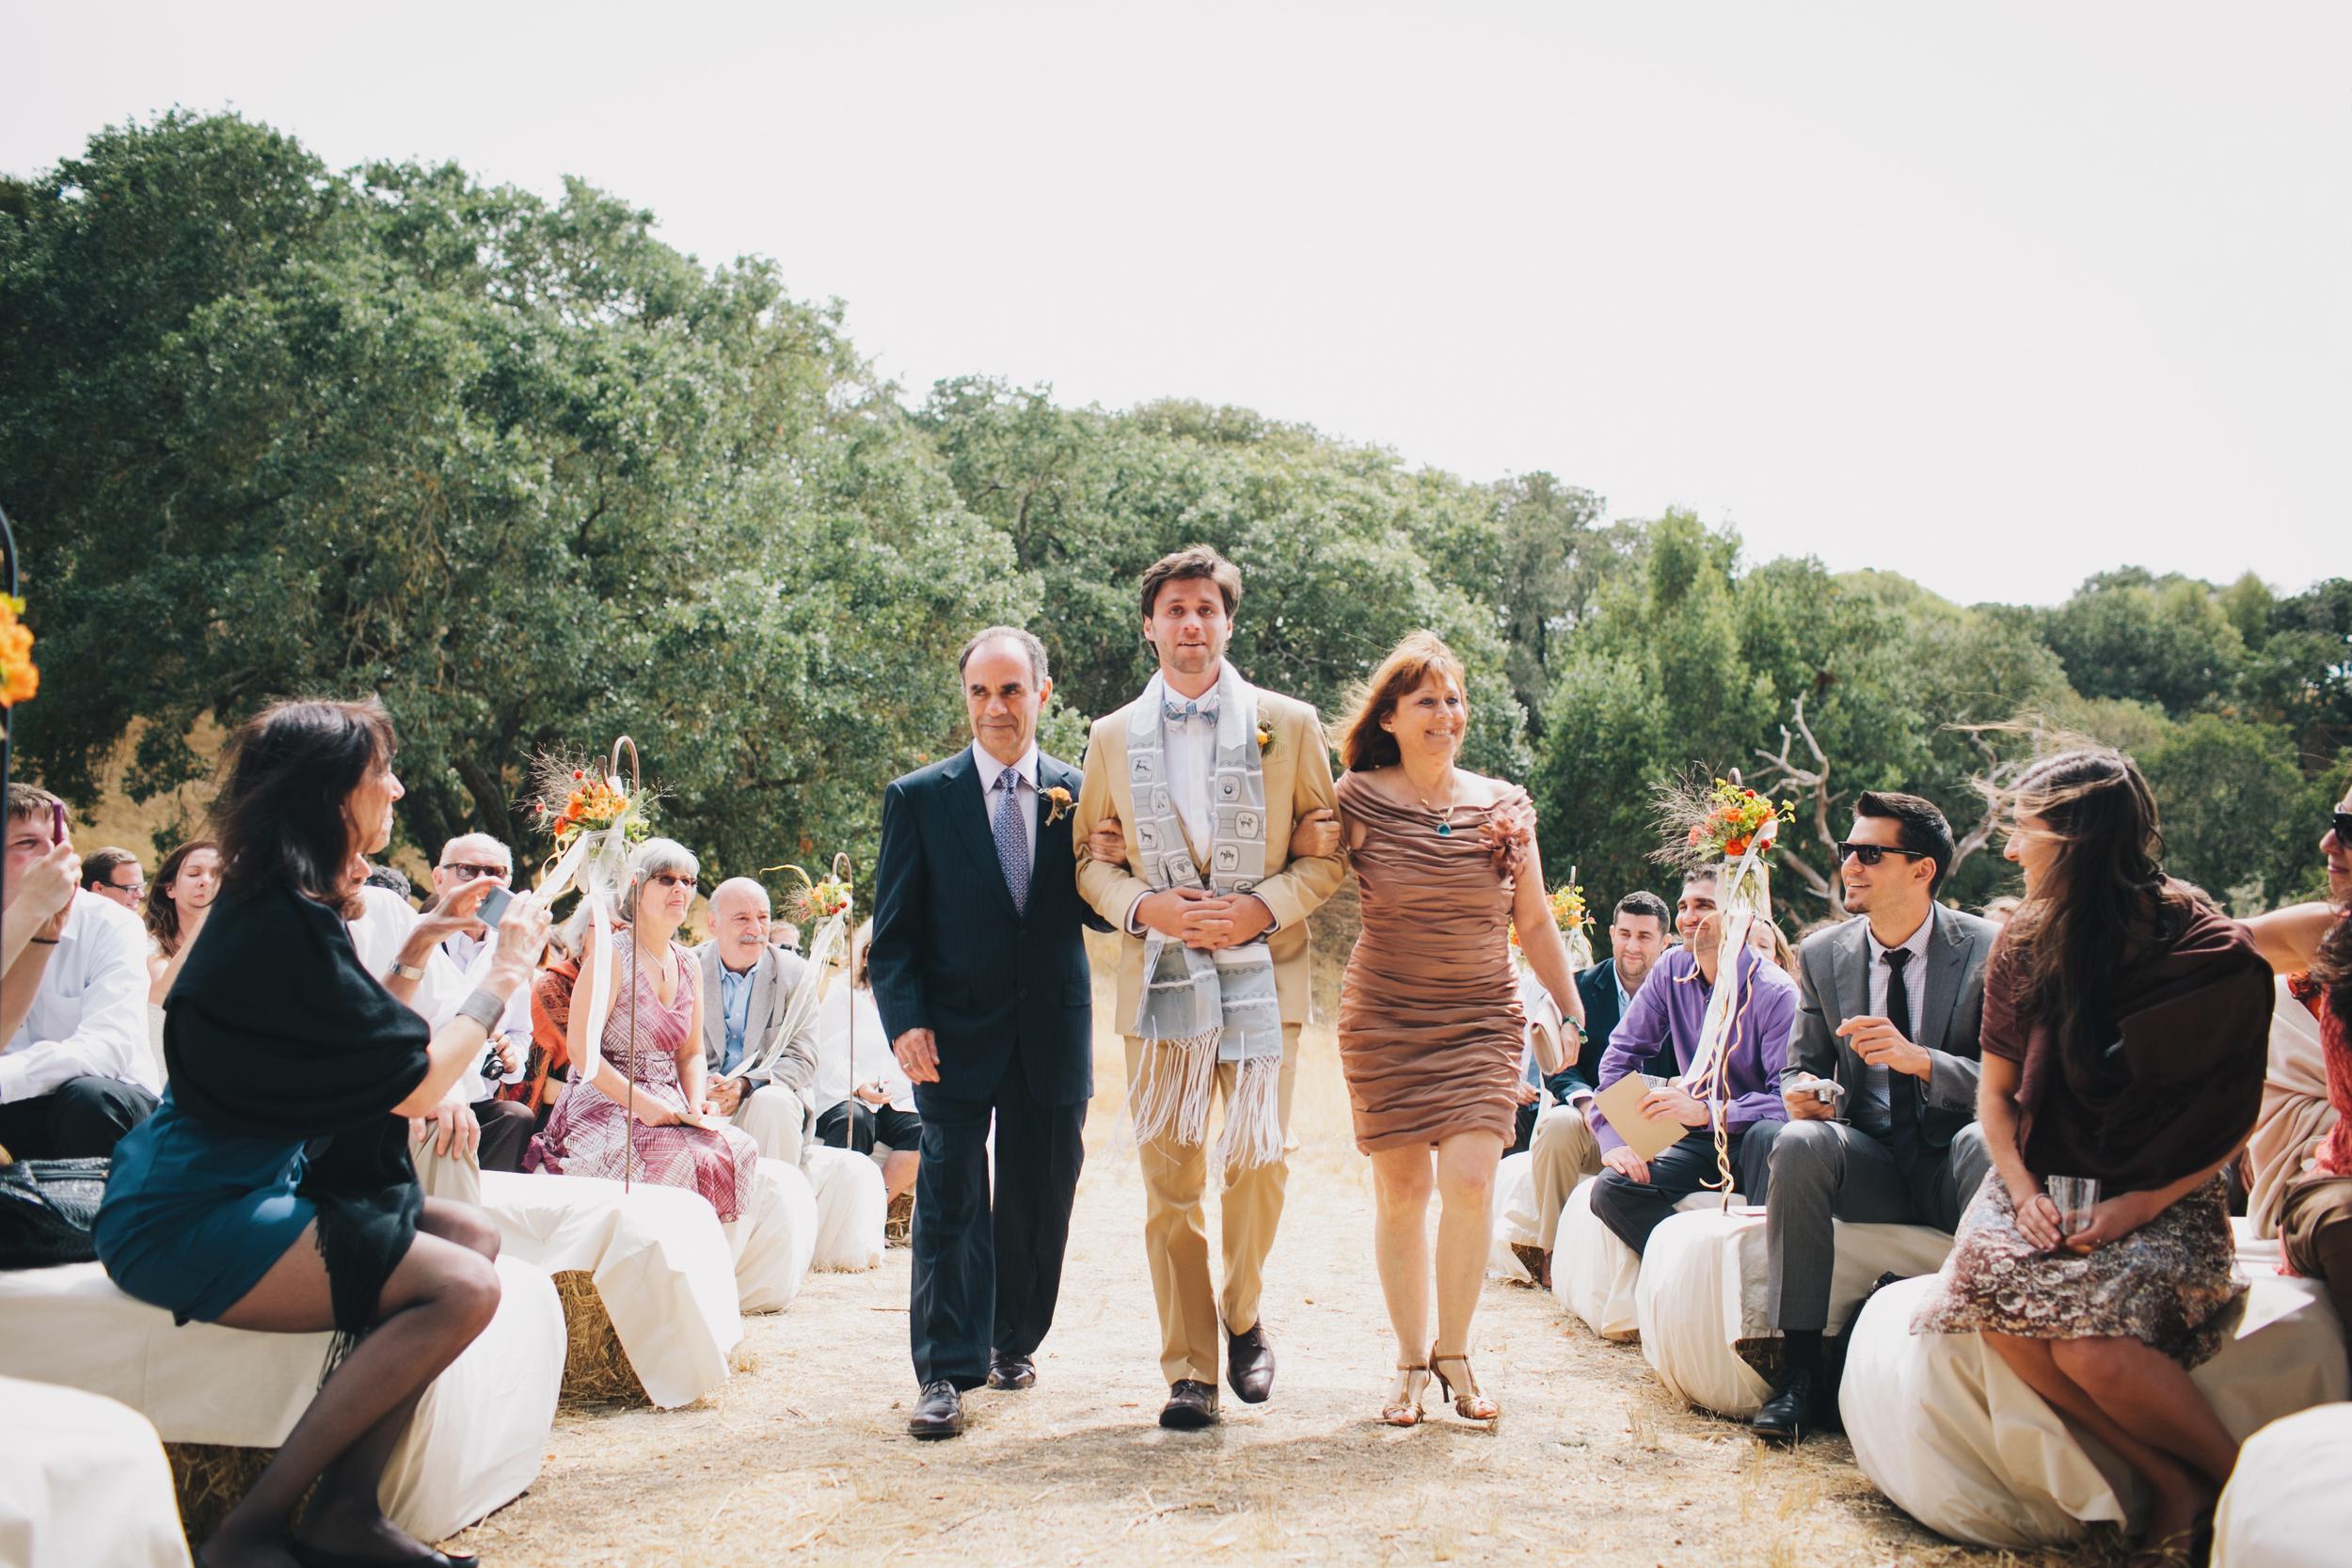 Petaluma_Wedding-14.JPG